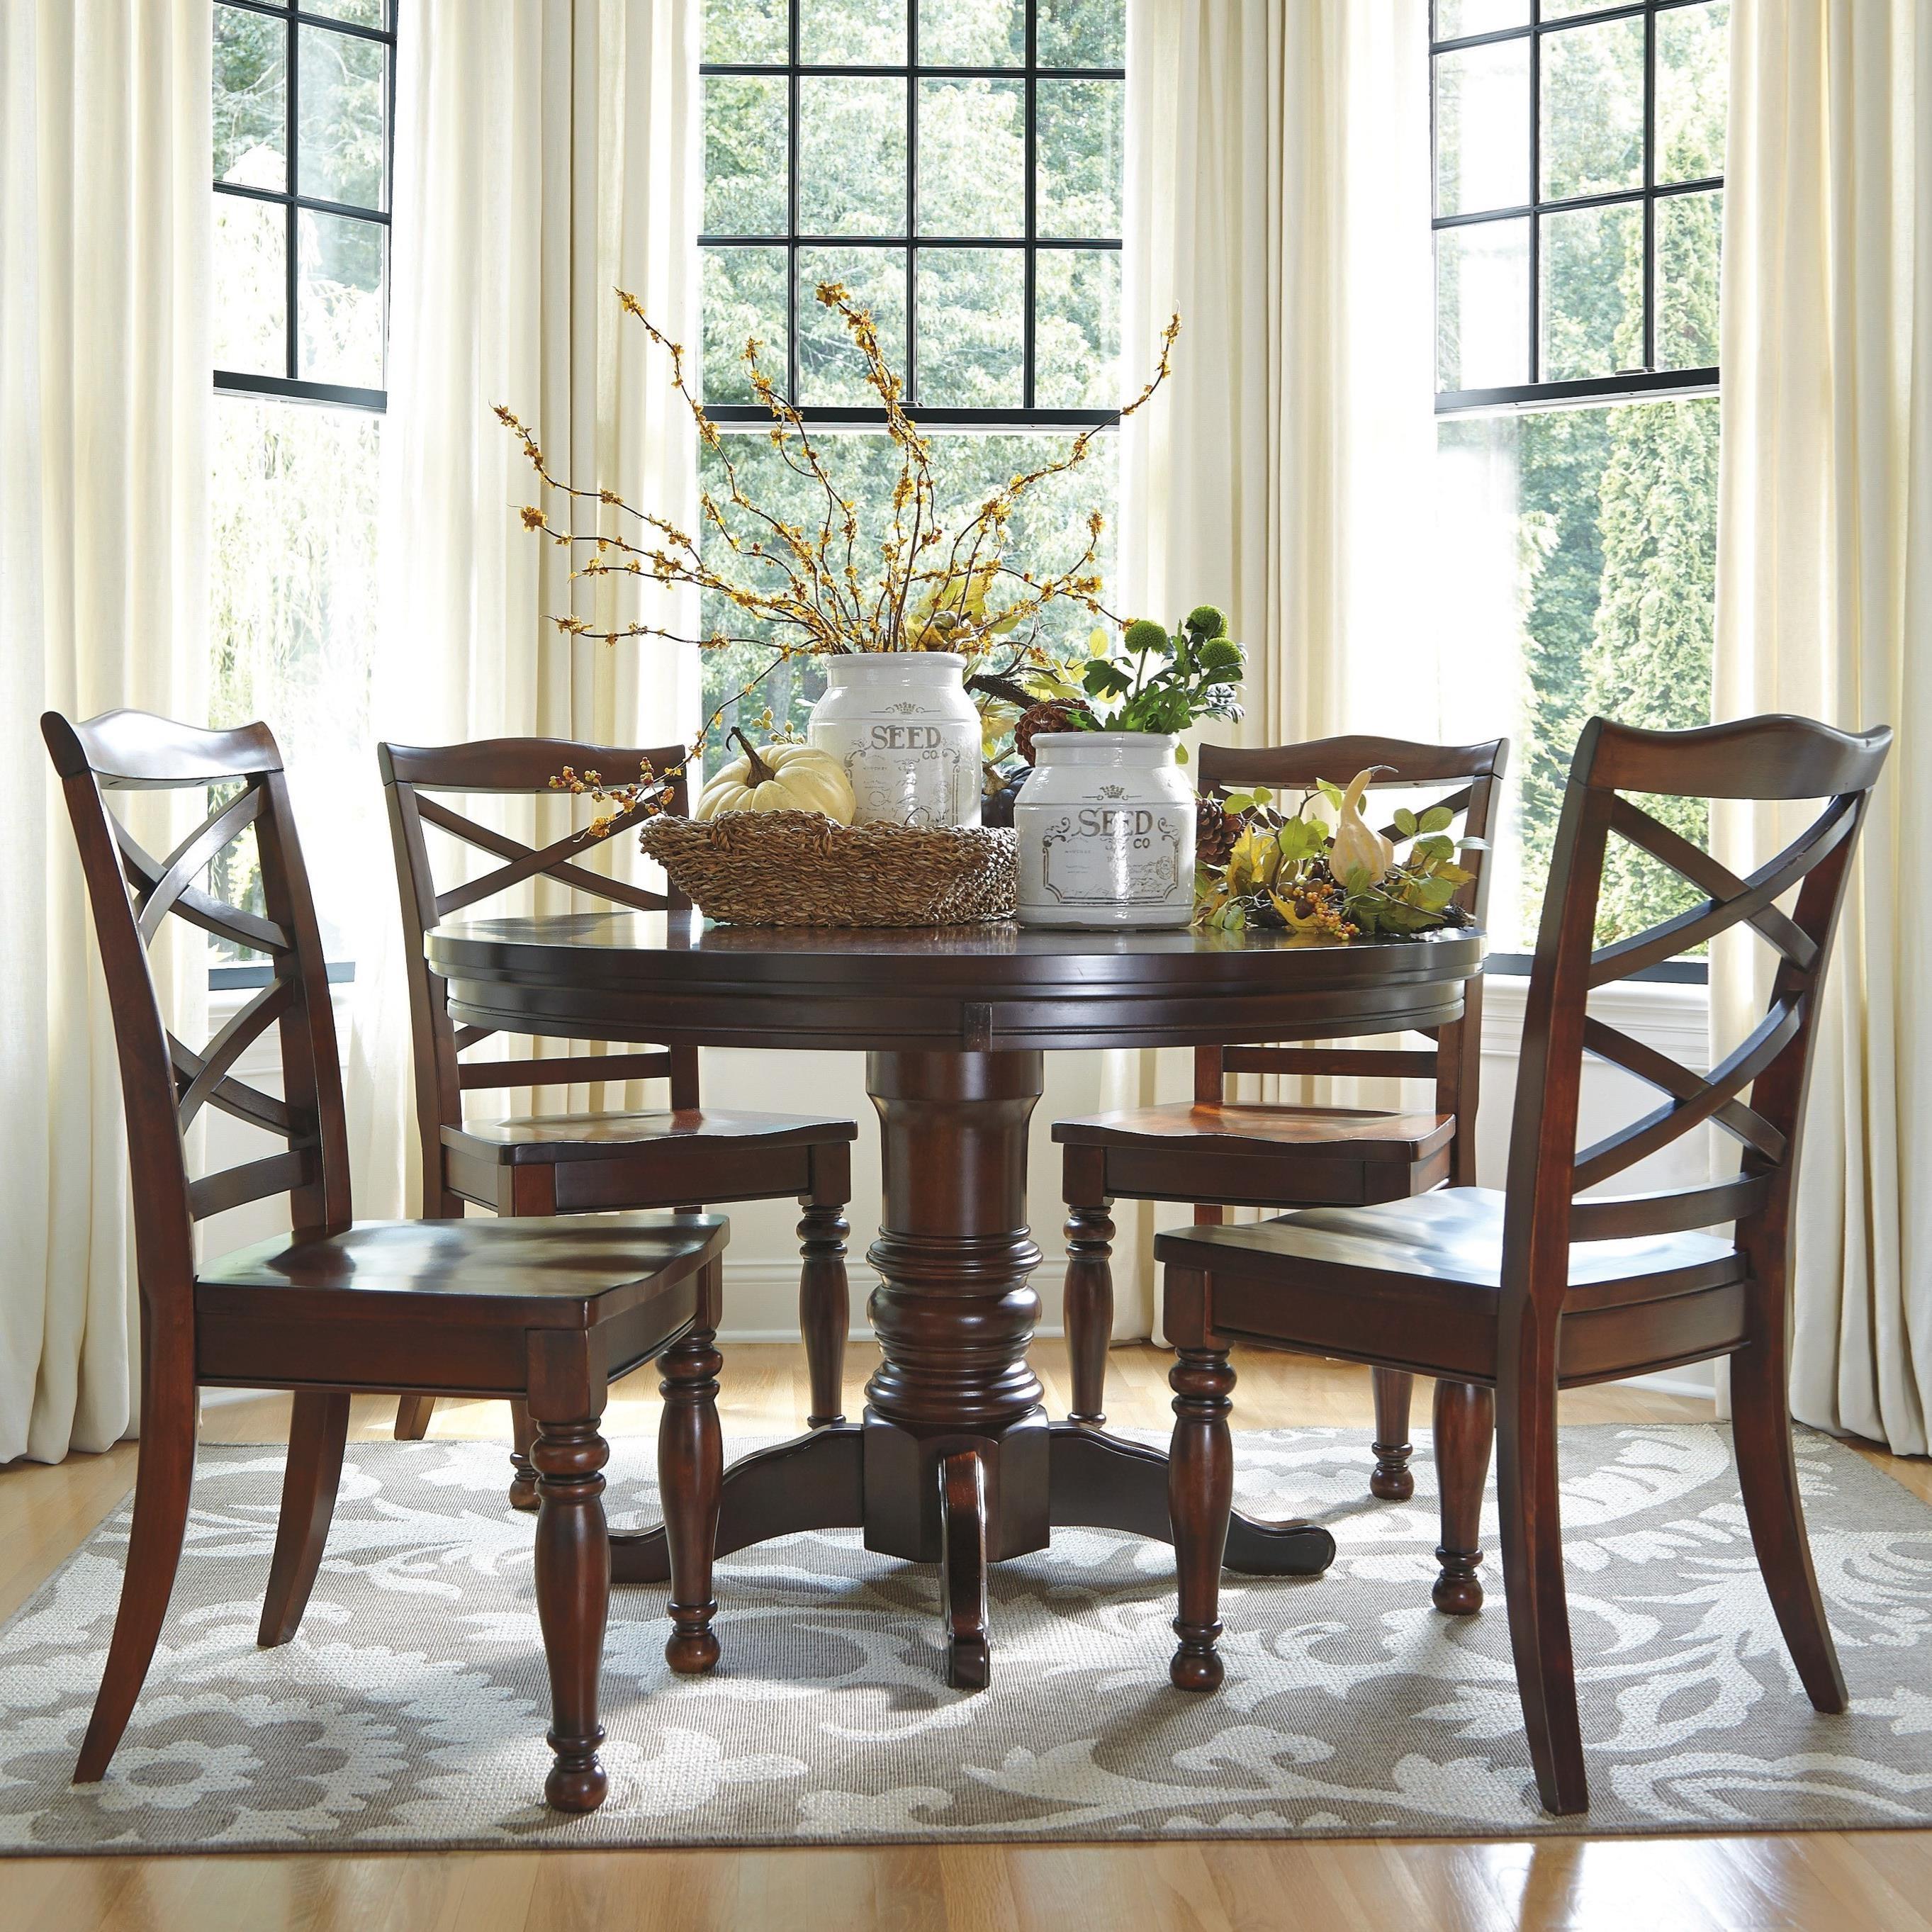 Ashley Furniture Porter 5 Piece Round Dining Table Set